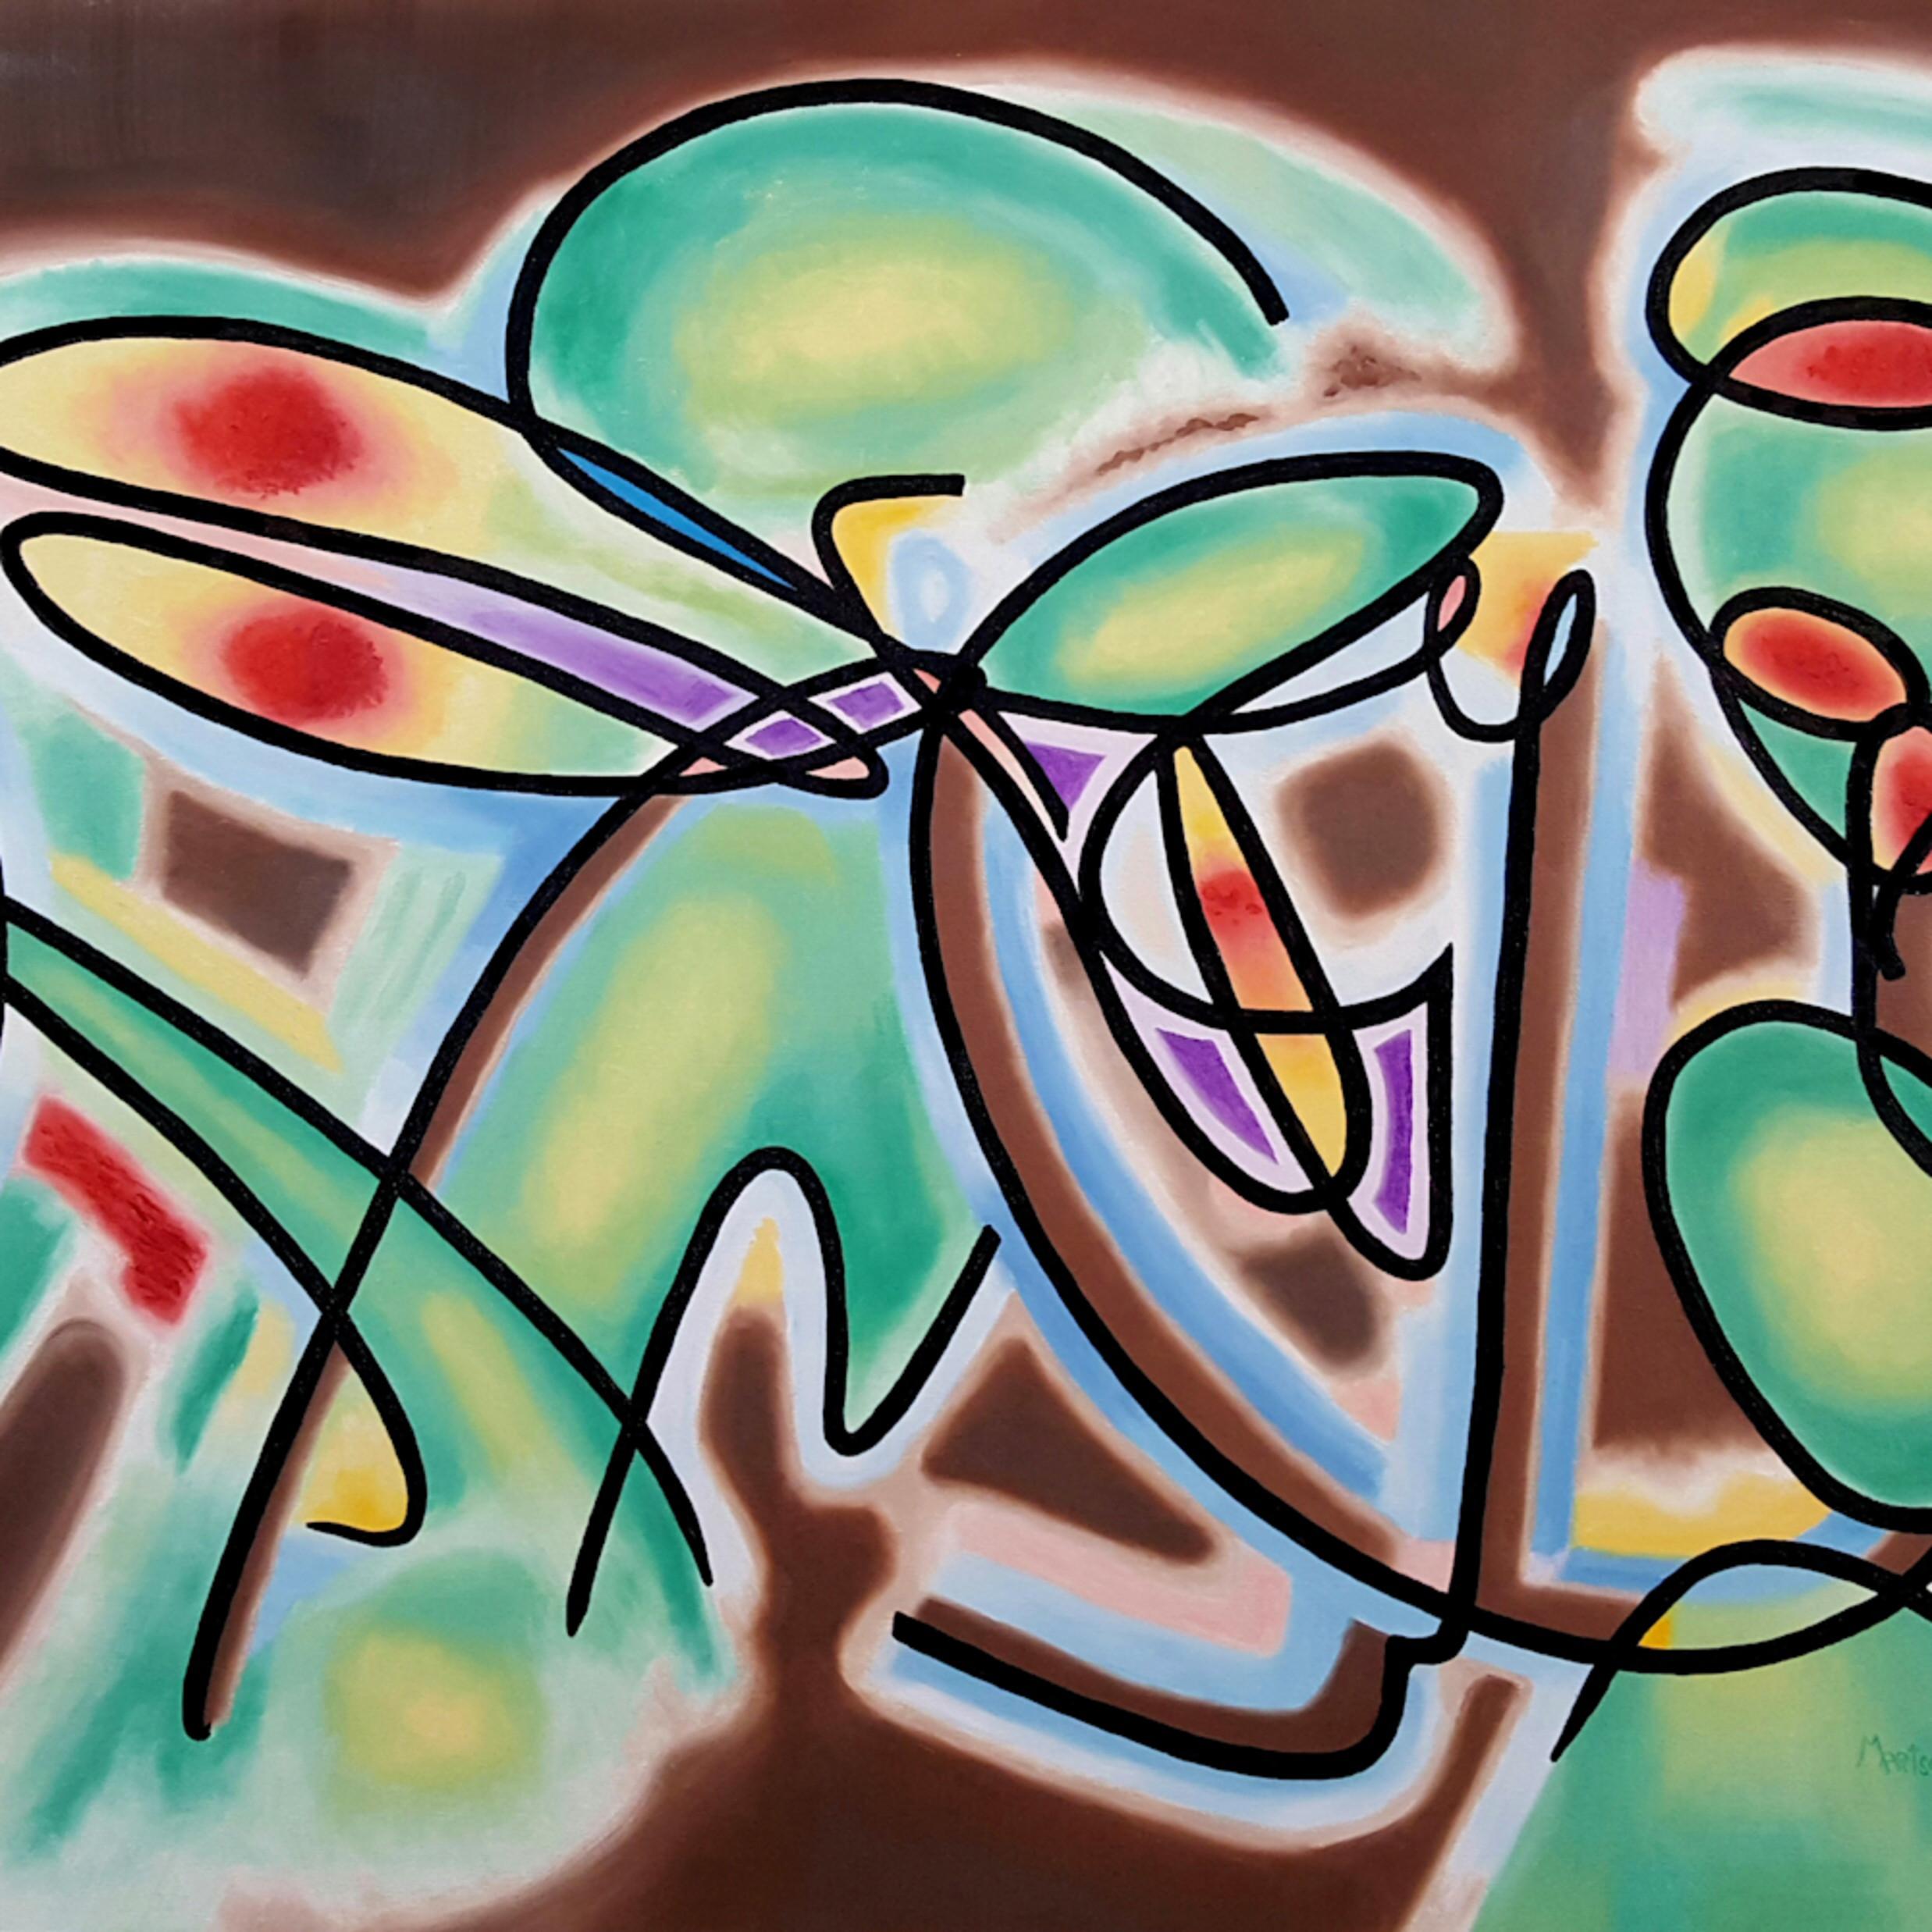 Dance 22 homage to frank stella etv7j1